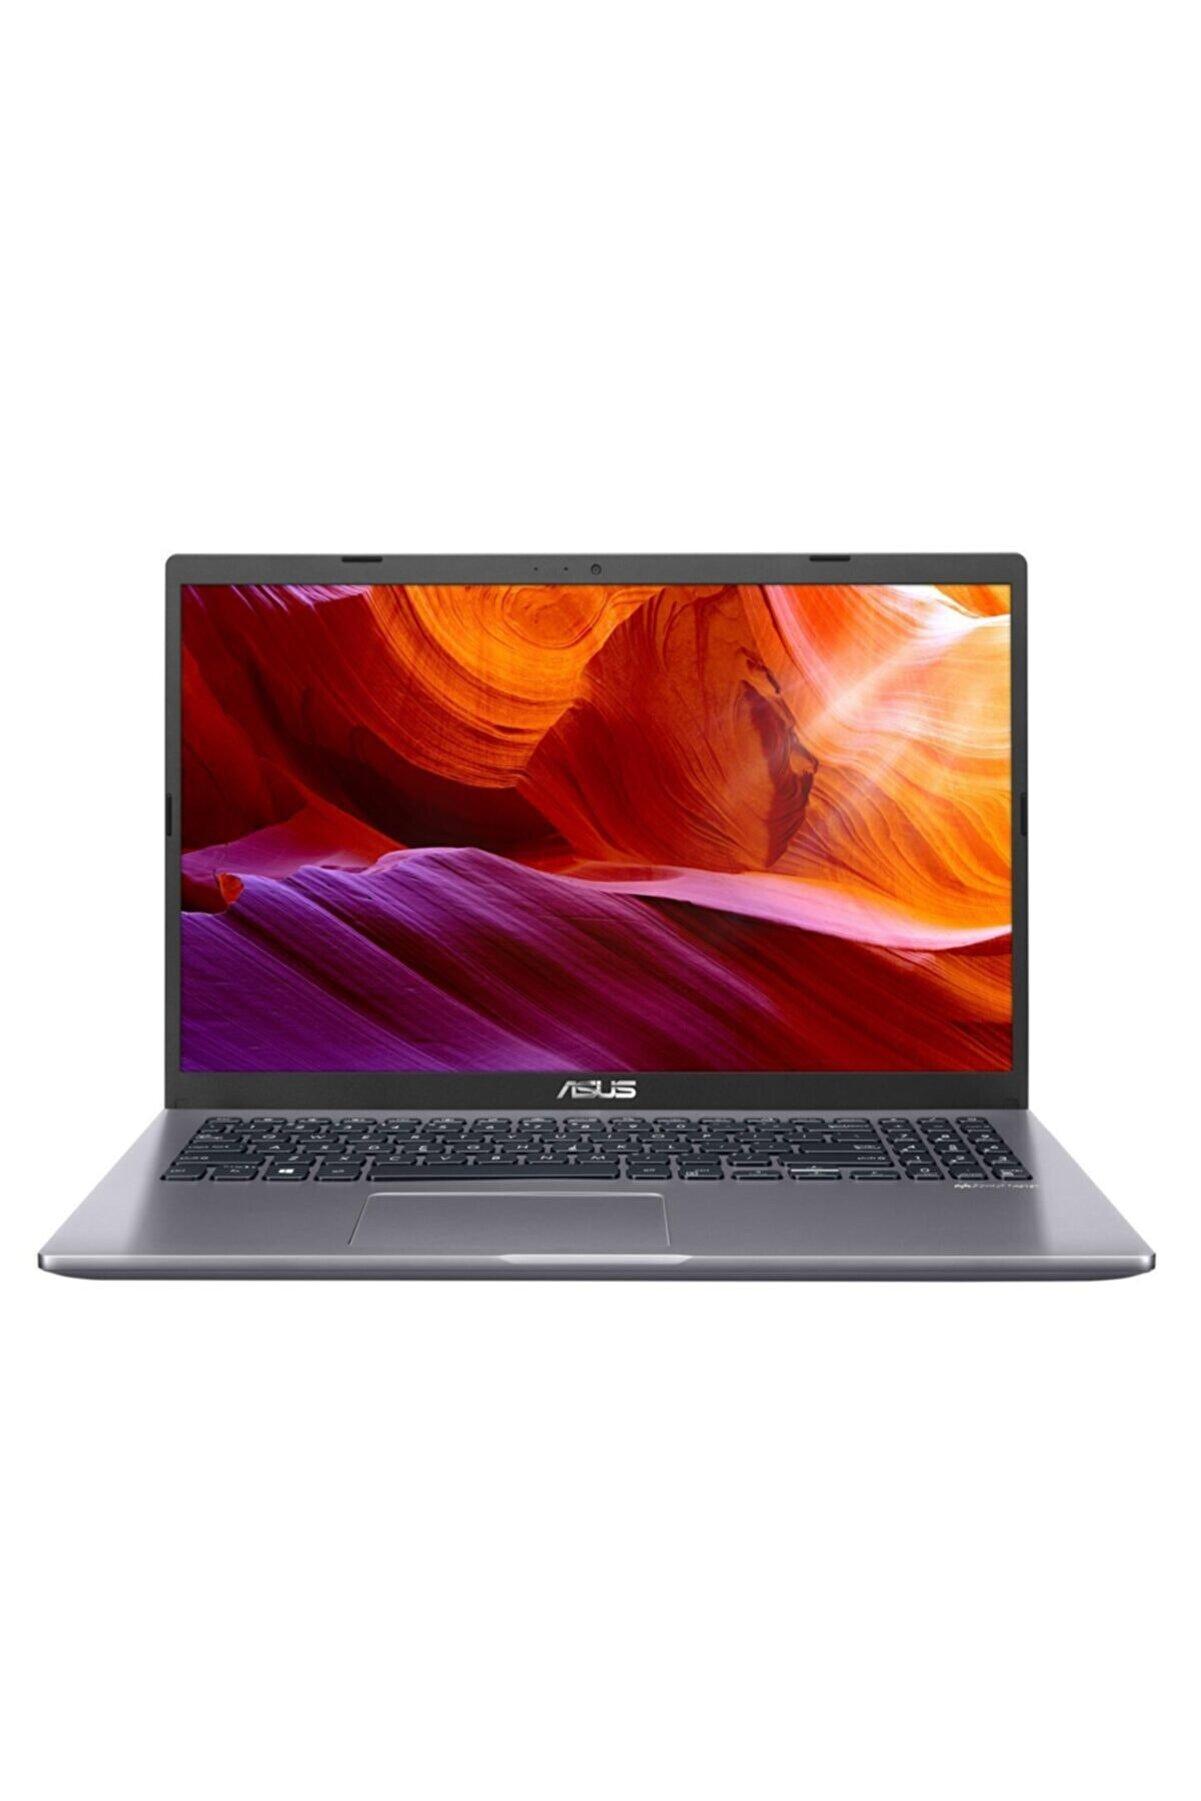 "ASUS X509fa-br951 I3-10110u 4 Gb 256 Gb 15.6"" Free Dos Hd Dizüstü Bilgisayar"